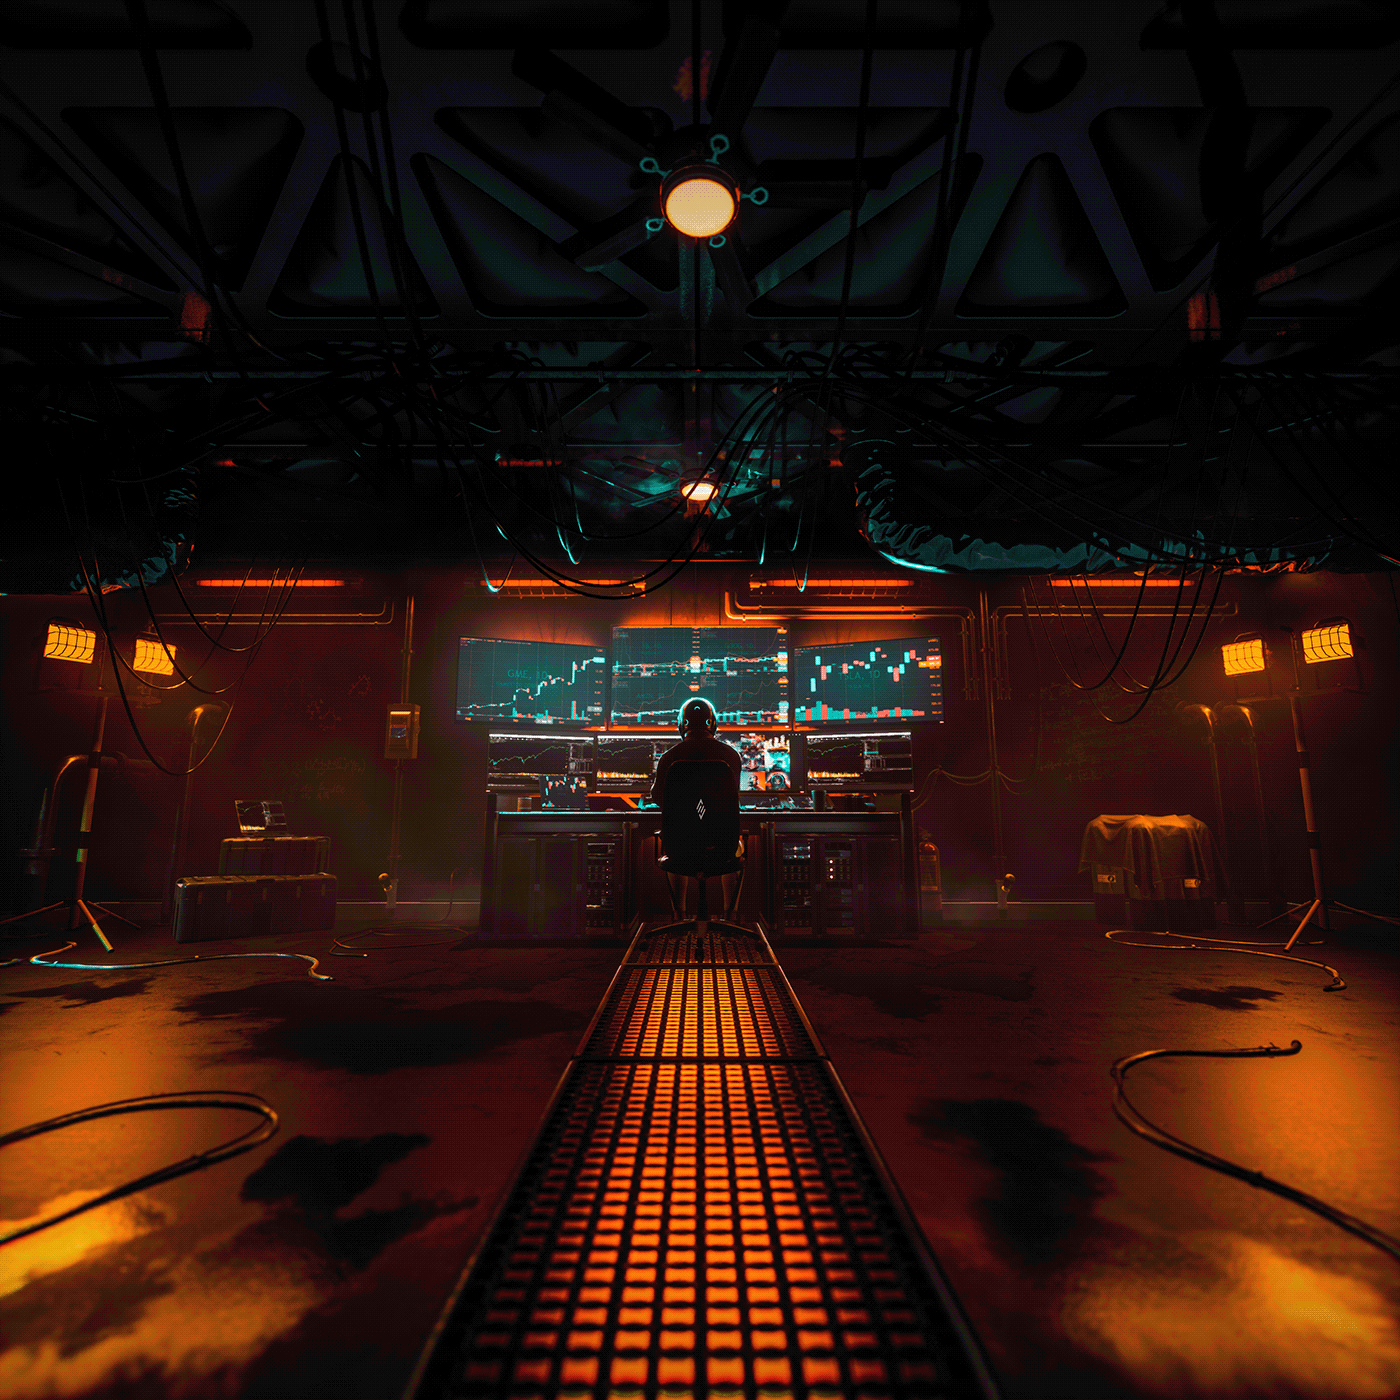 art CGI cinematic cryptoart Cyberpunk motion nft stocks trading